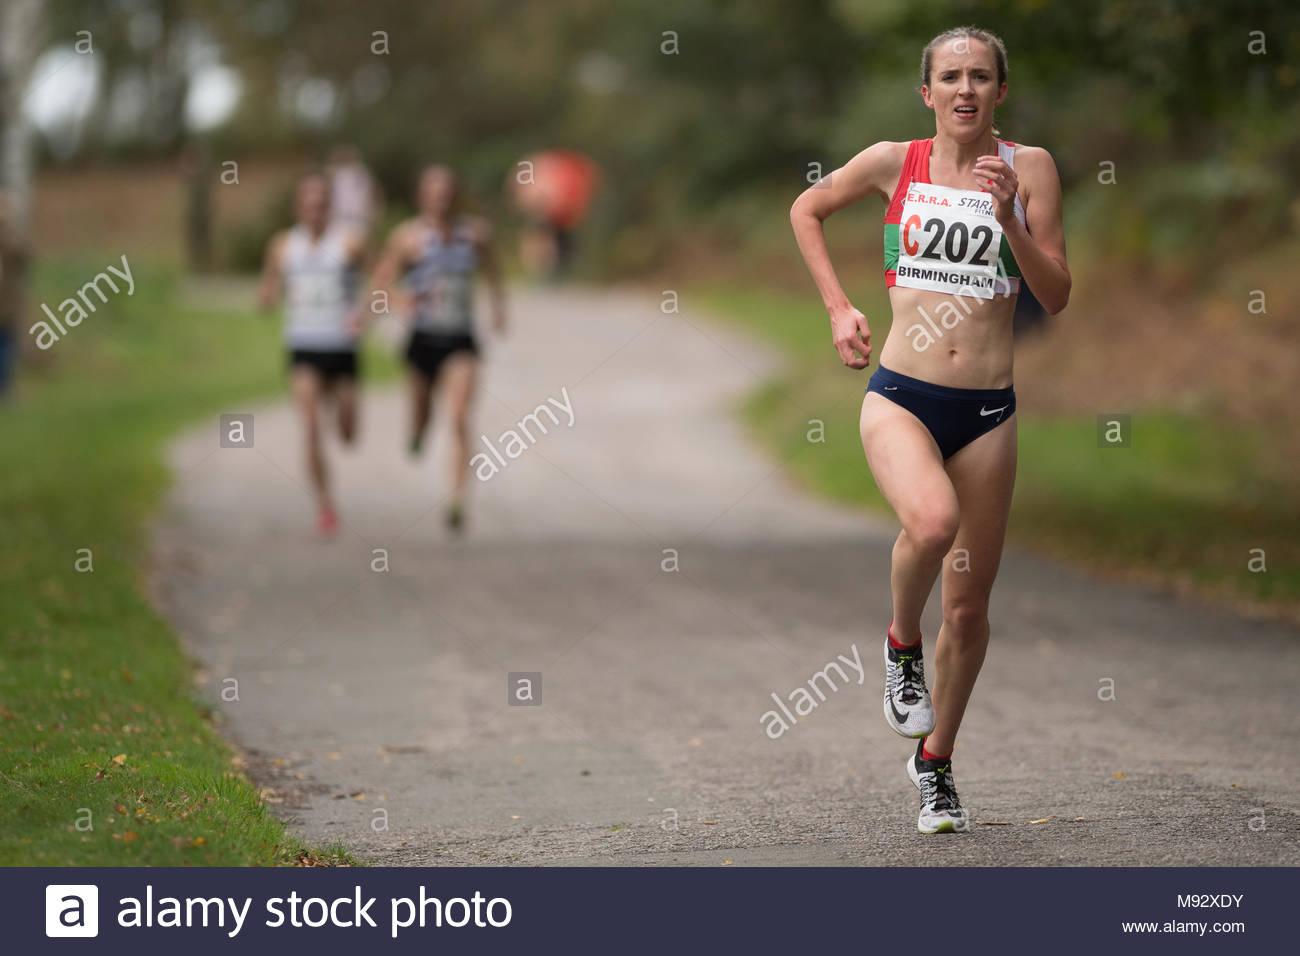 Emelia Gorecka runs a leg at the ERRA national 4 stage relays October 2017 - Stock Image